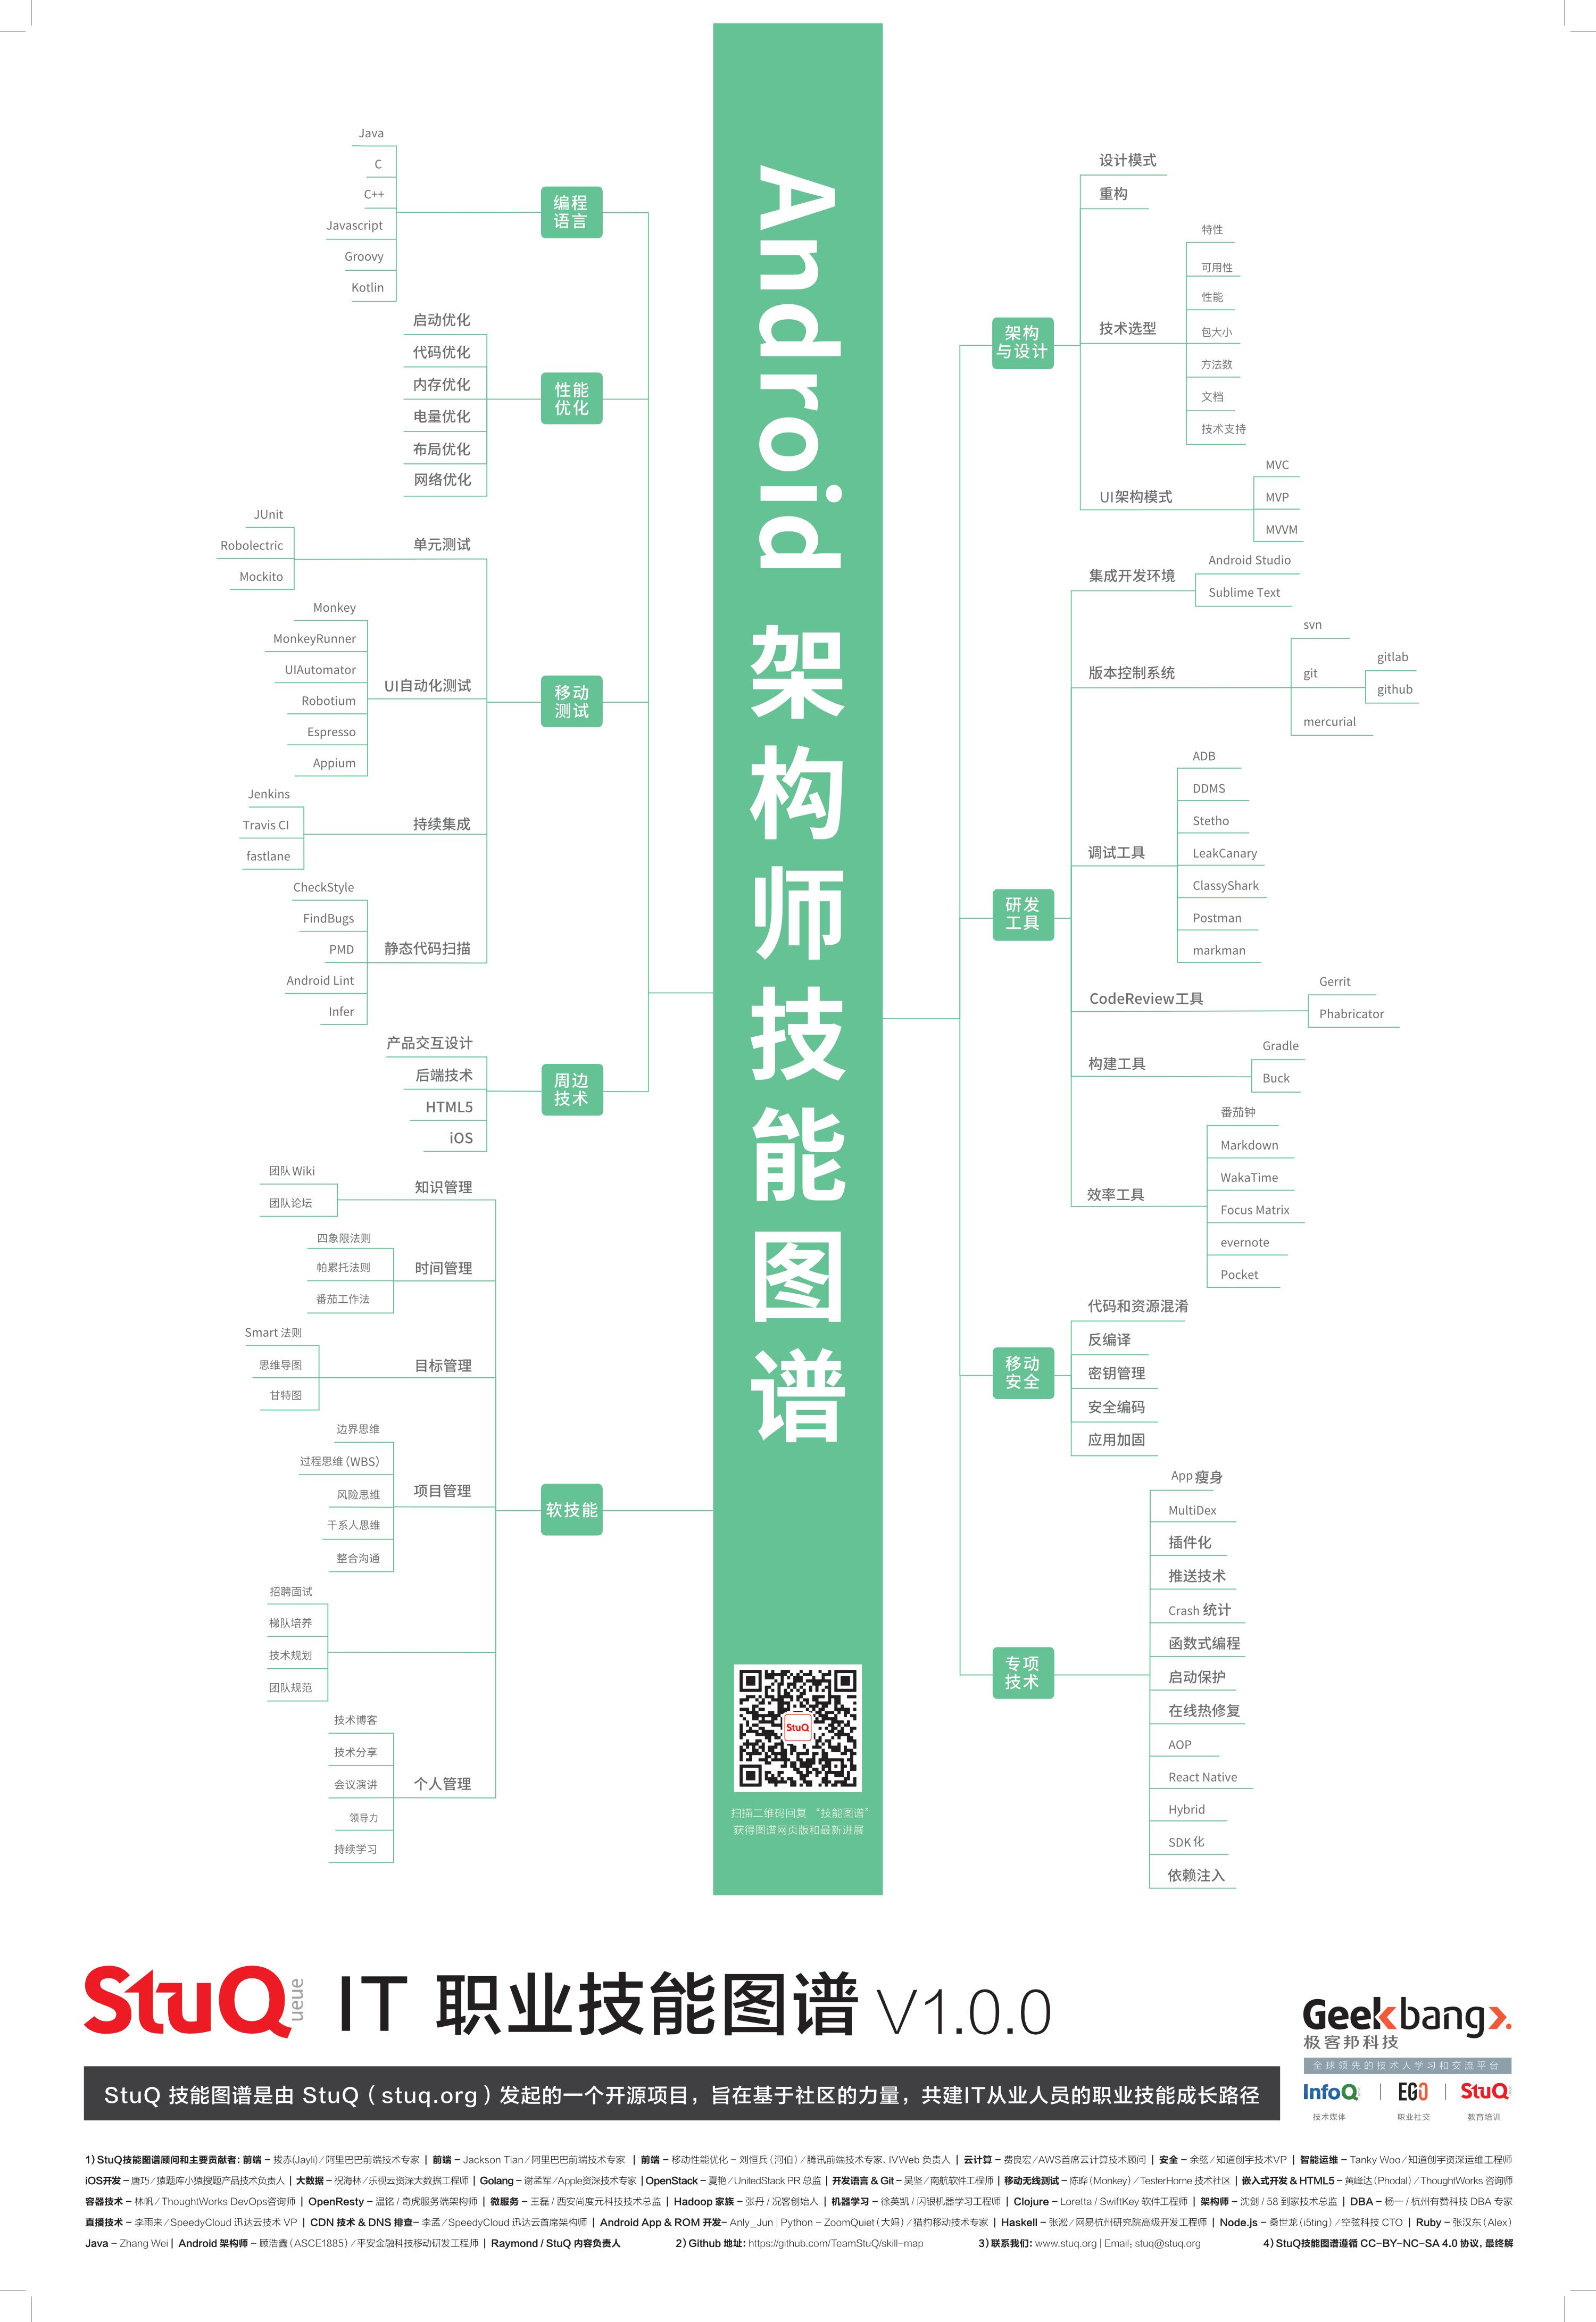 20181205_程序员技能图谱-Android架构师-by-StuQ.png